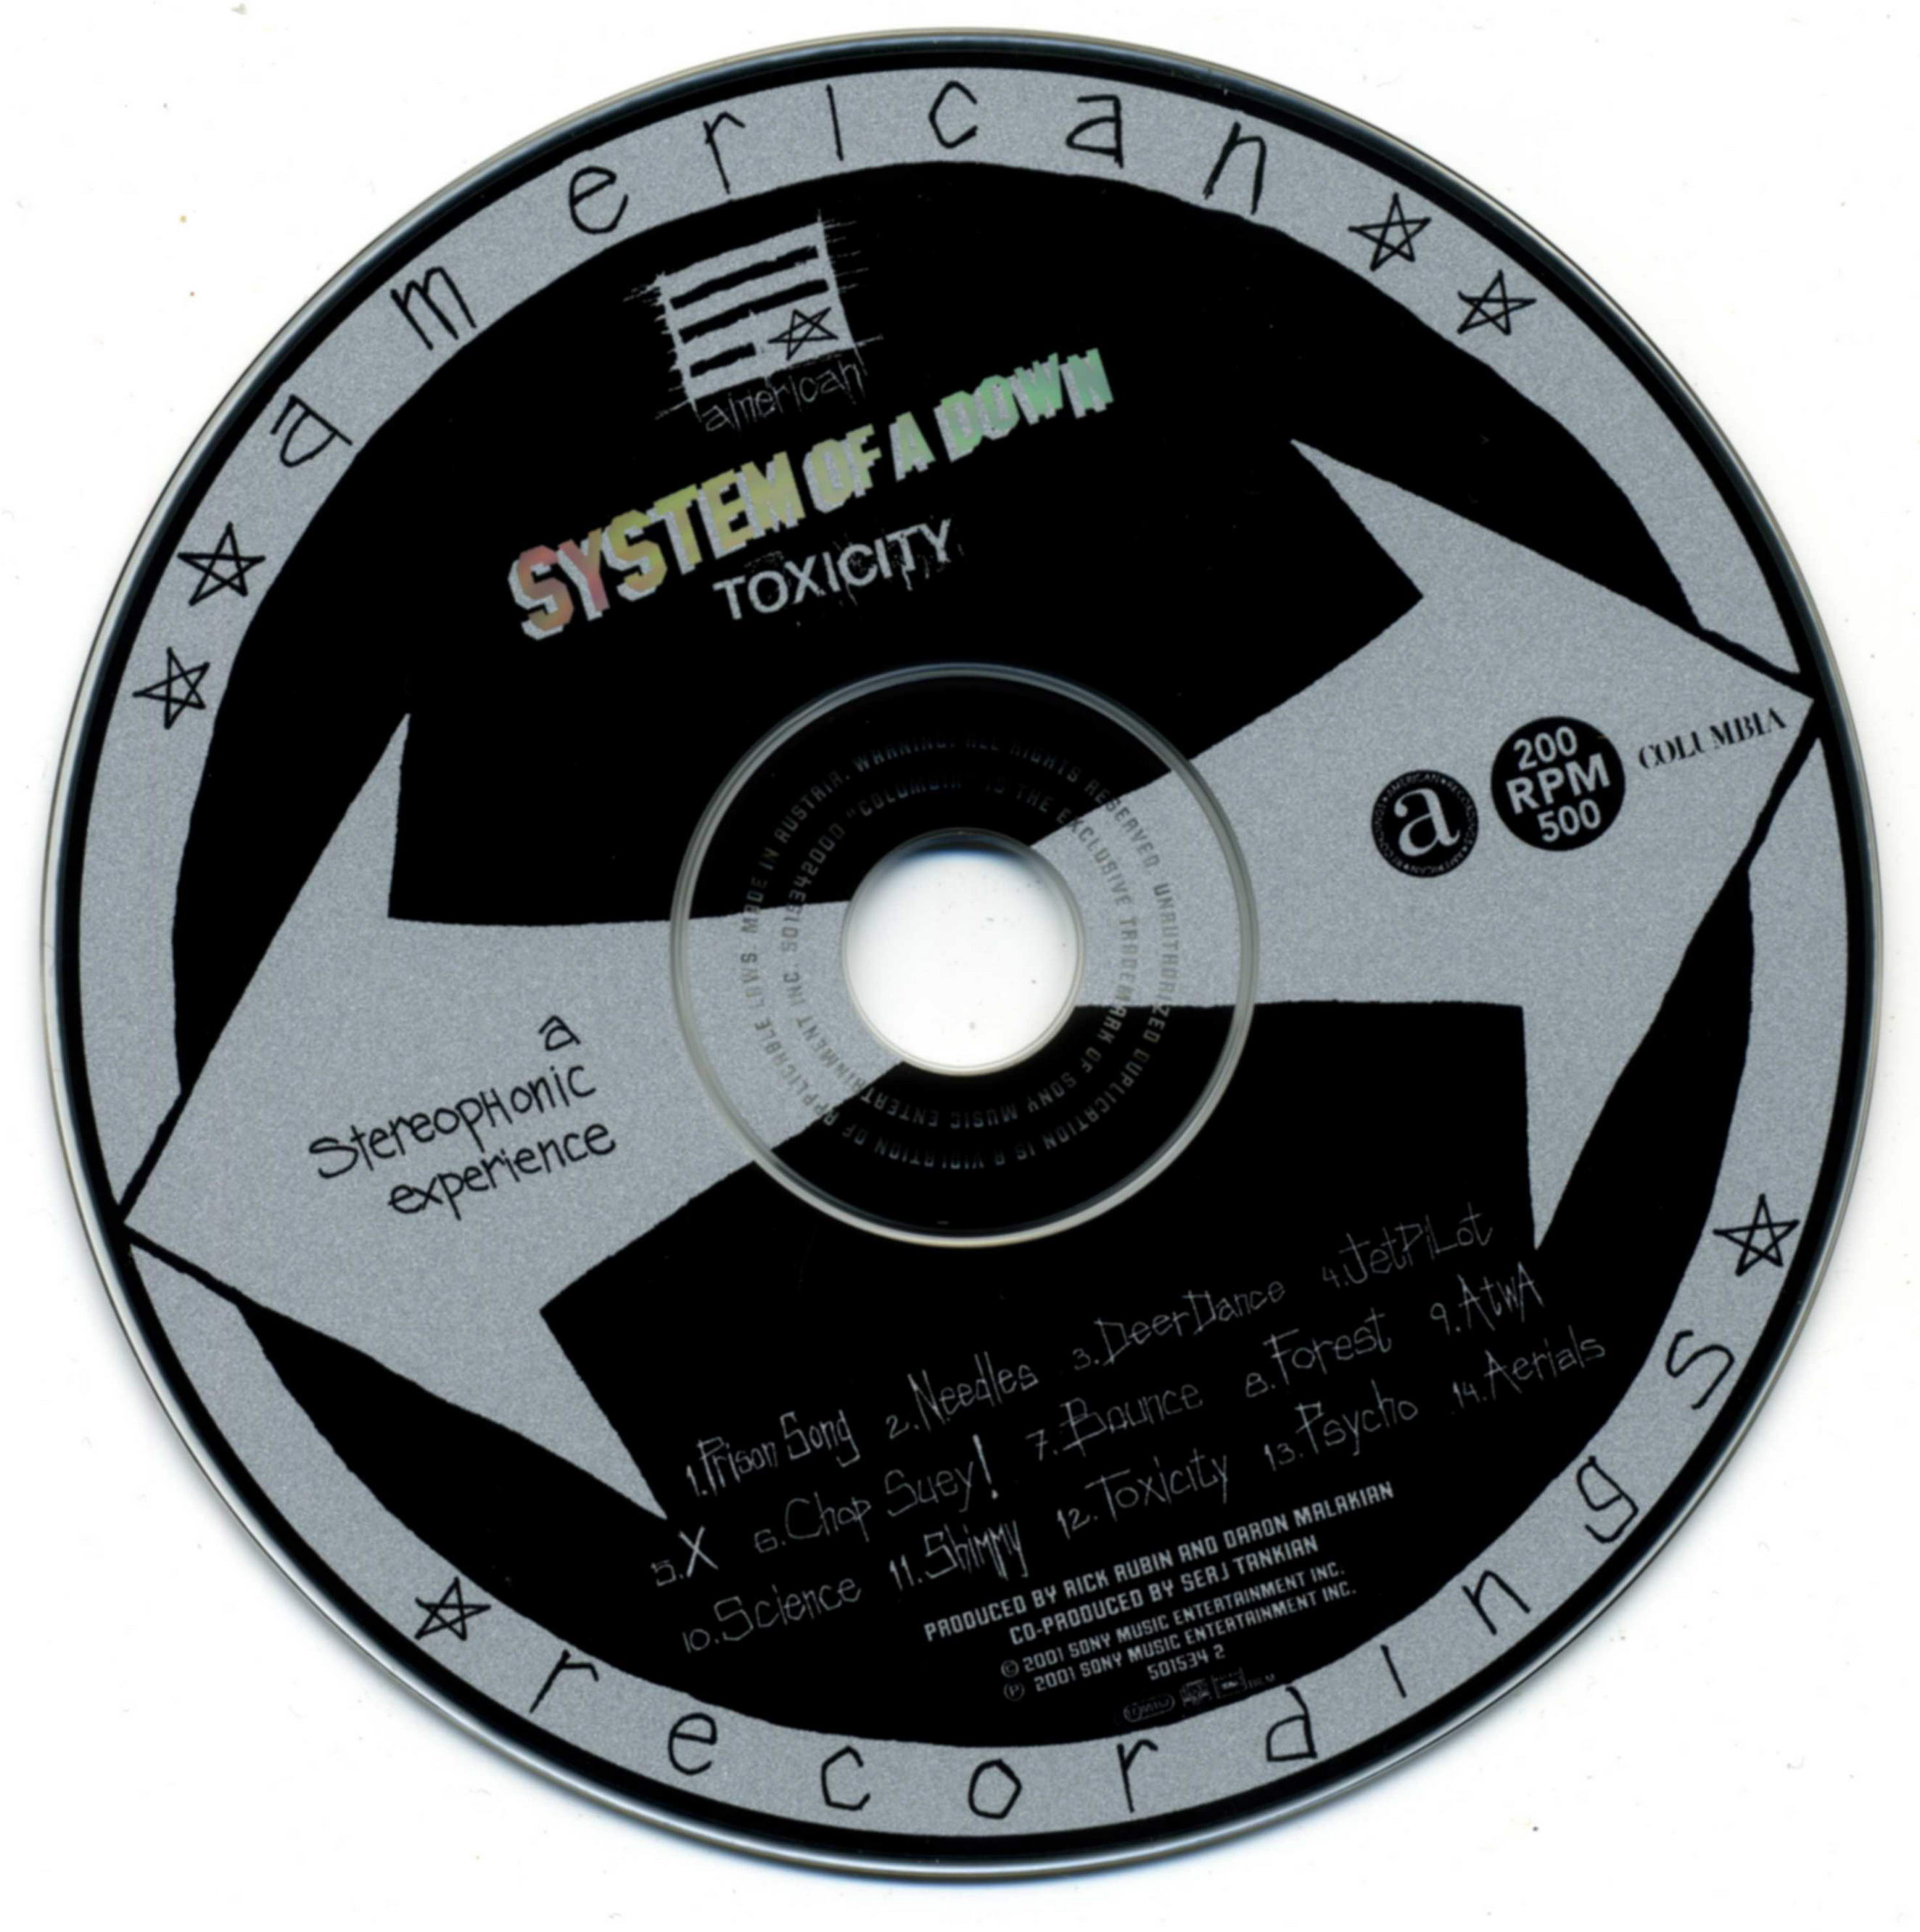 System Of A Down Mezmerize Album Cover Art Down toxicity album cover Toxicity System Of A Down Video